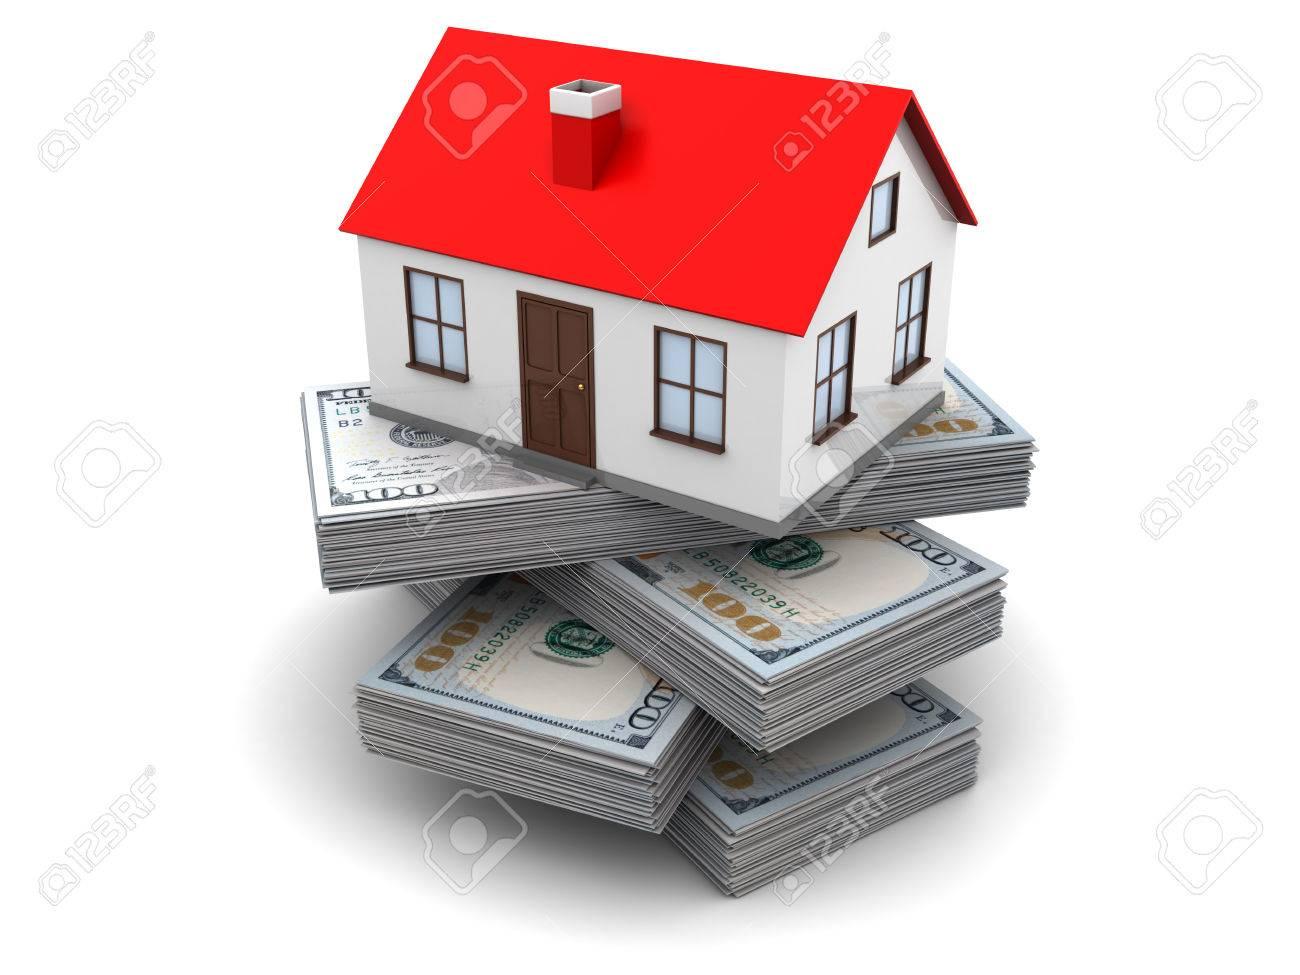 3d illustration of money for home concept - 38627297